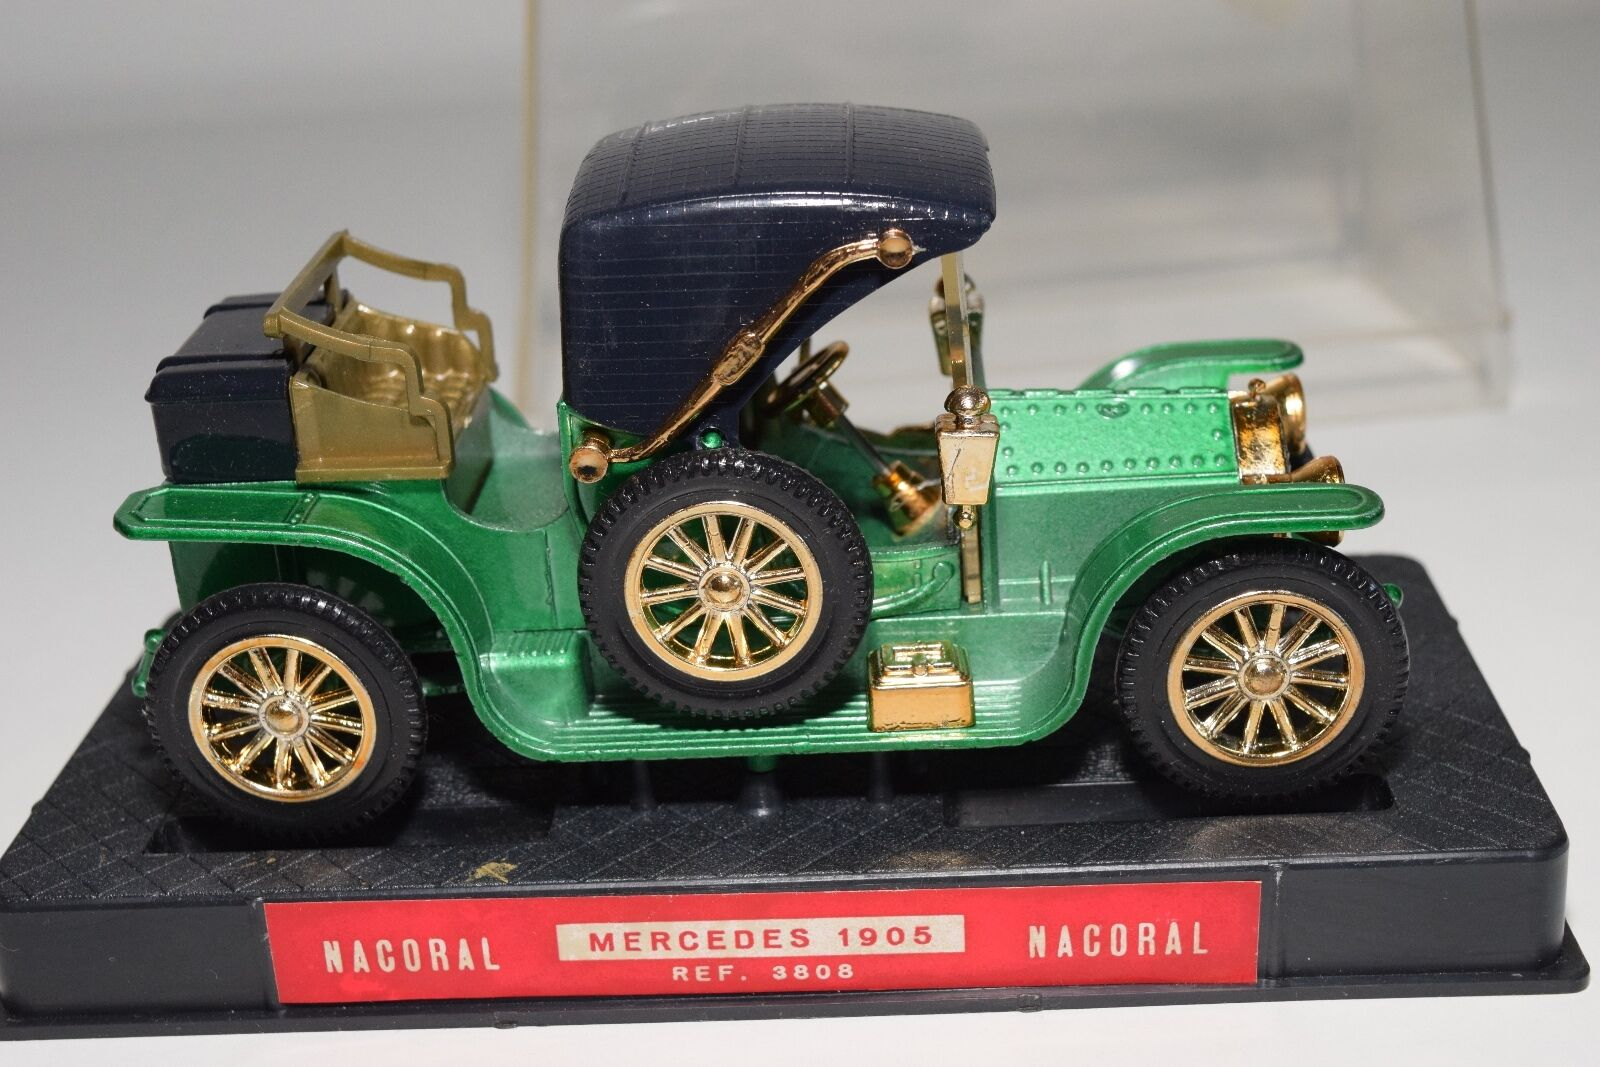 + + + NACORAL 3808 MERCEDES BENZ 1905 METALLIC GREEN MINT BOXED RARE SELTEN ab3083